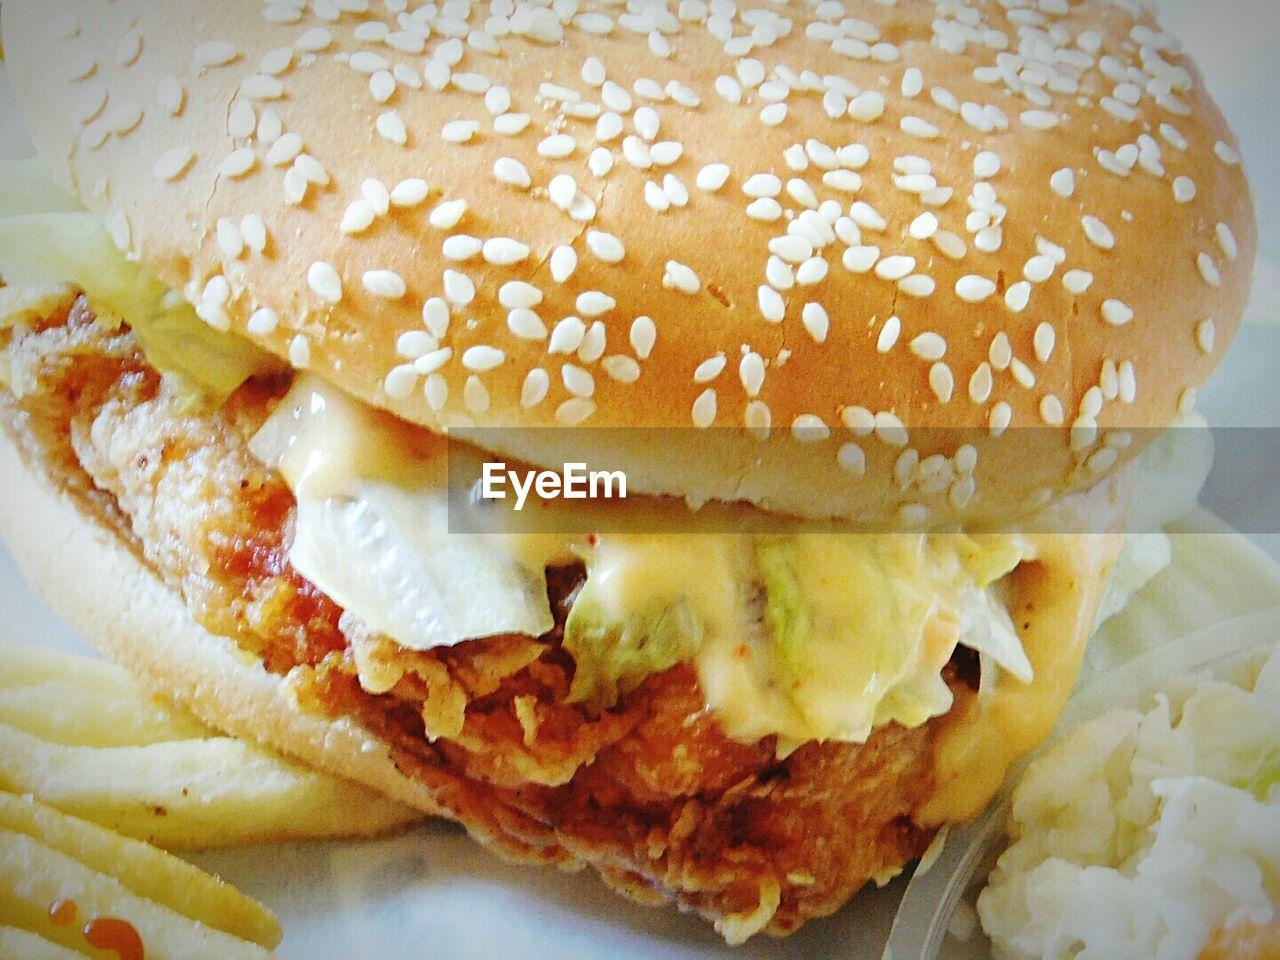 food and drink, burger, food, unhealthy eating, bun, indoors, close-up, ready-to-eat, hamburger, indulgence, no people, freshness, fast food, day